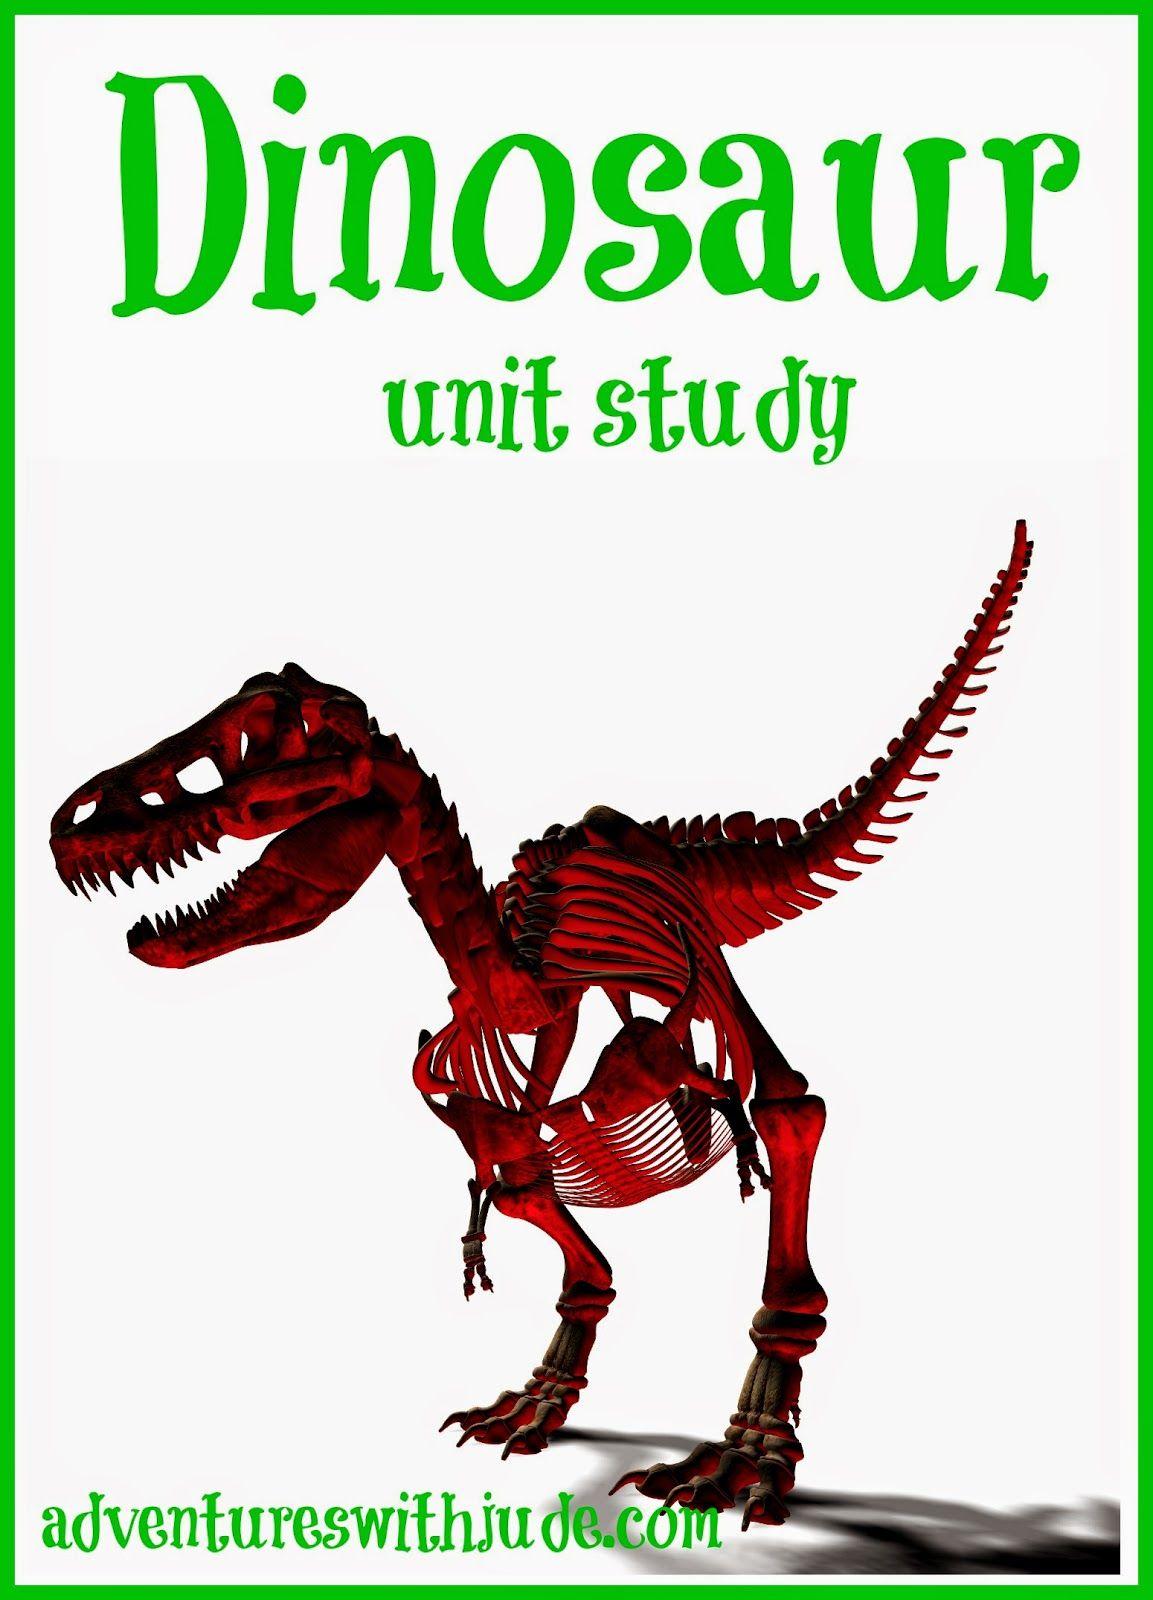 Our Dinosaur Unit Study Homeschool Unitstudy